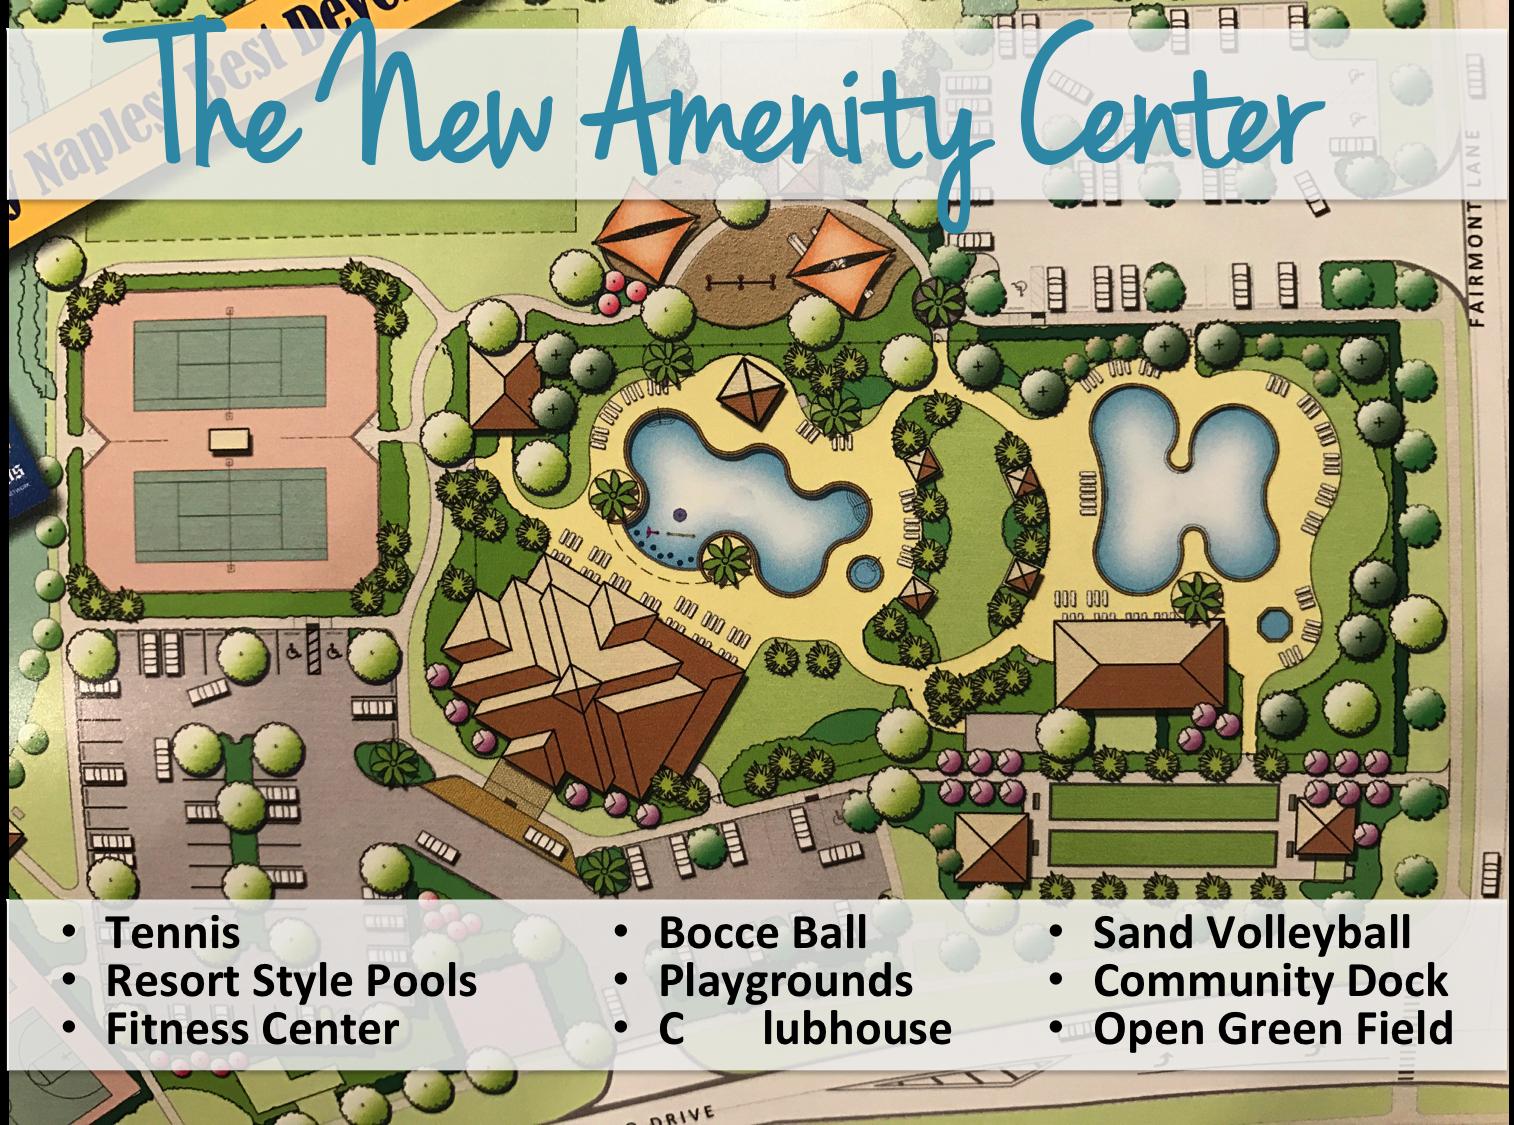 Mandarin Lane Community Center - Naples, Florida